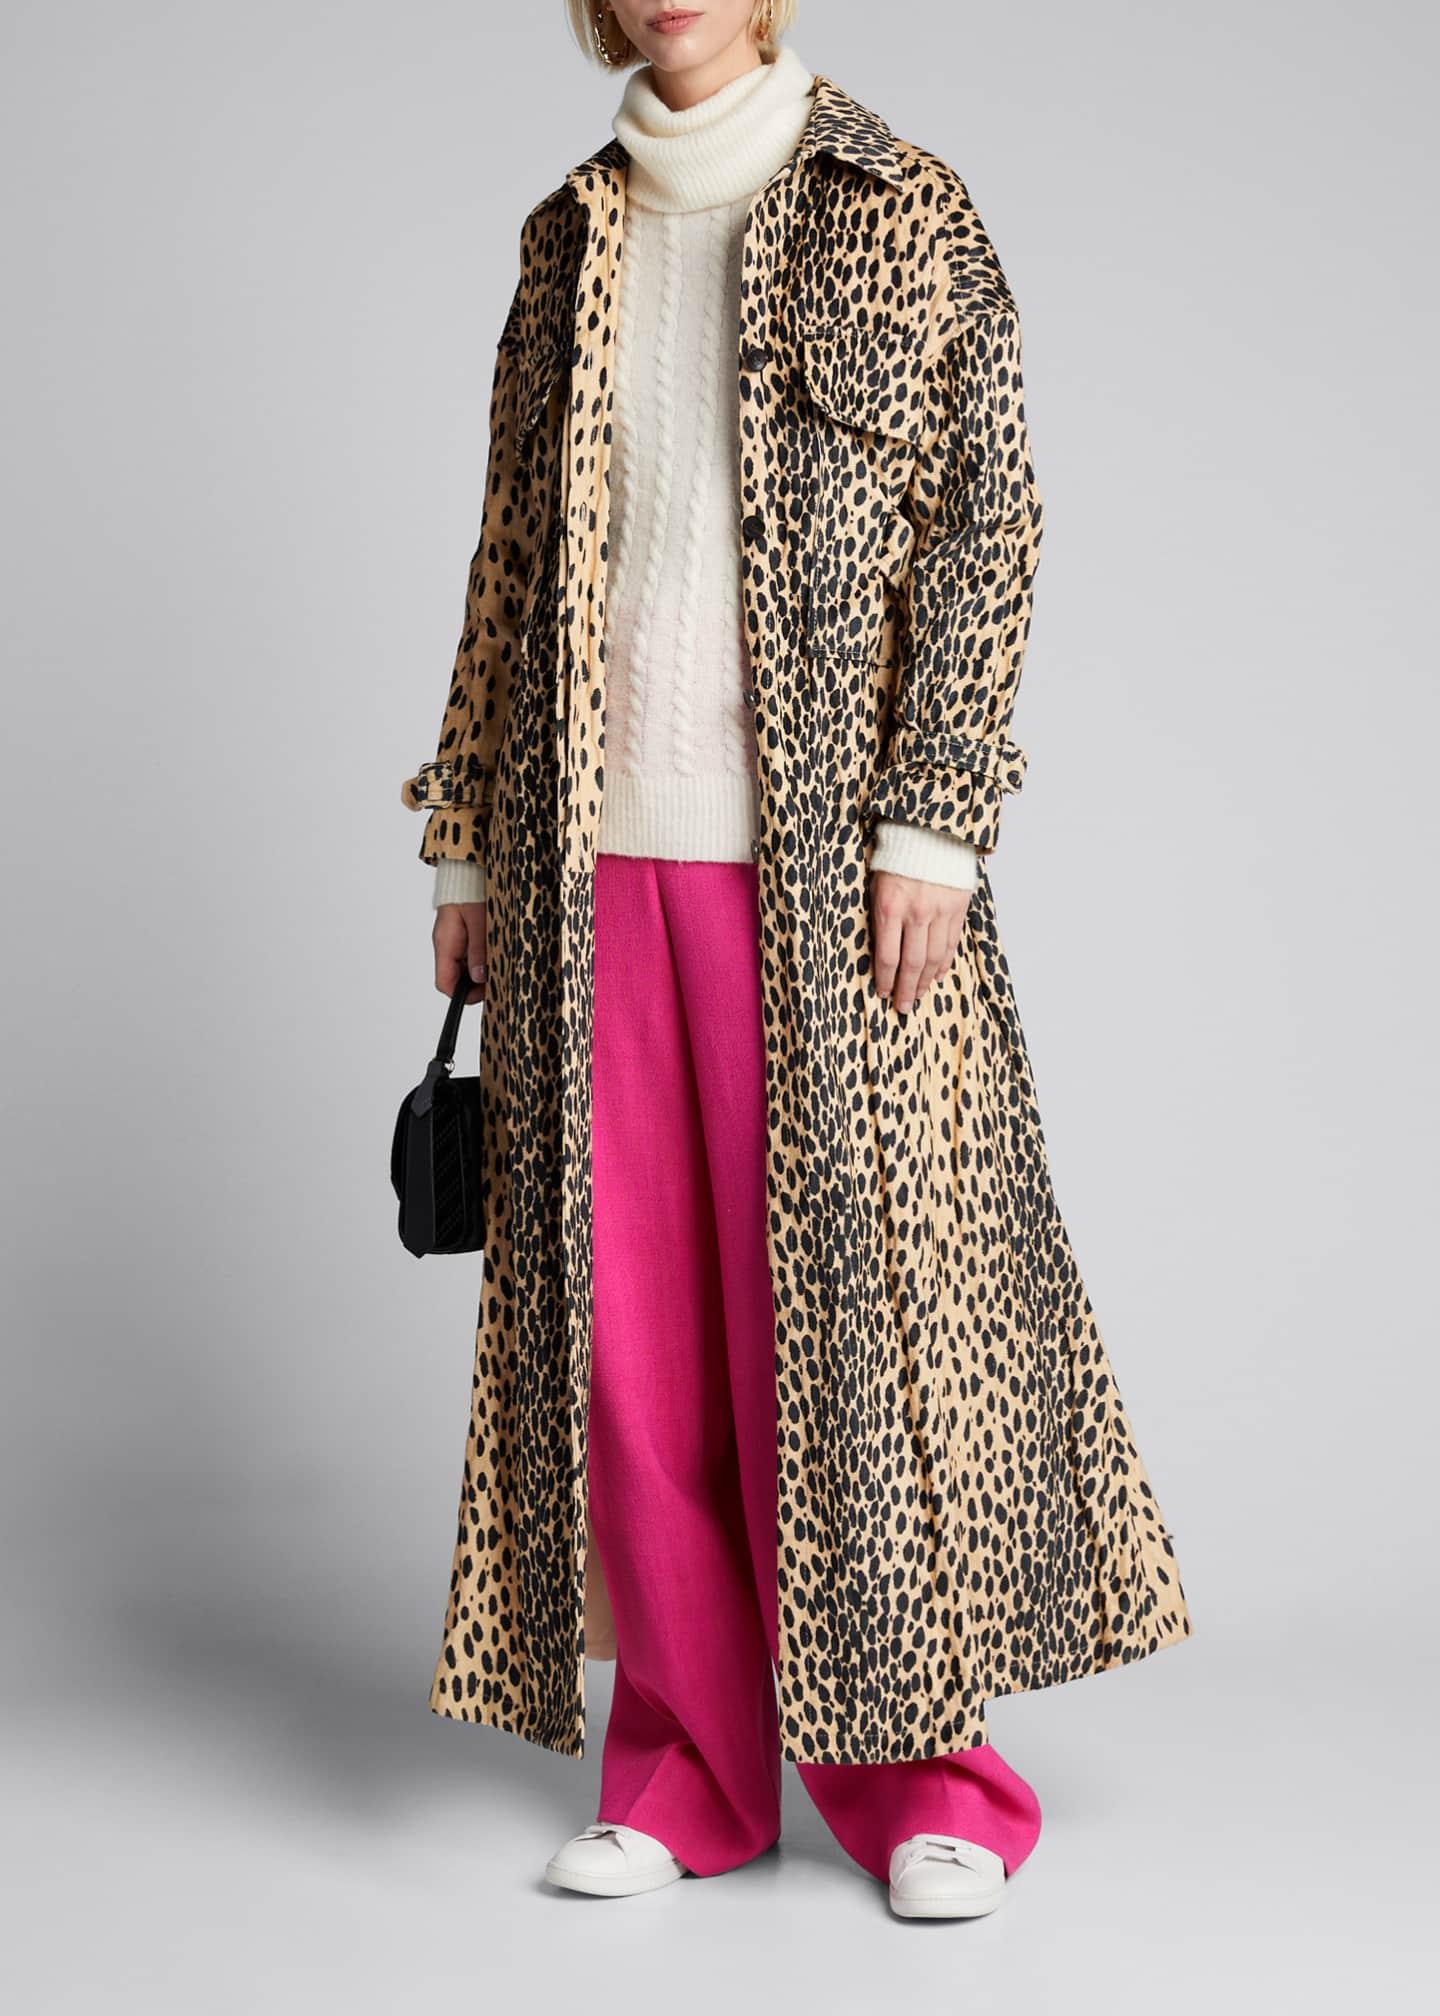 Jacquemus Animal-Print Trench Coat